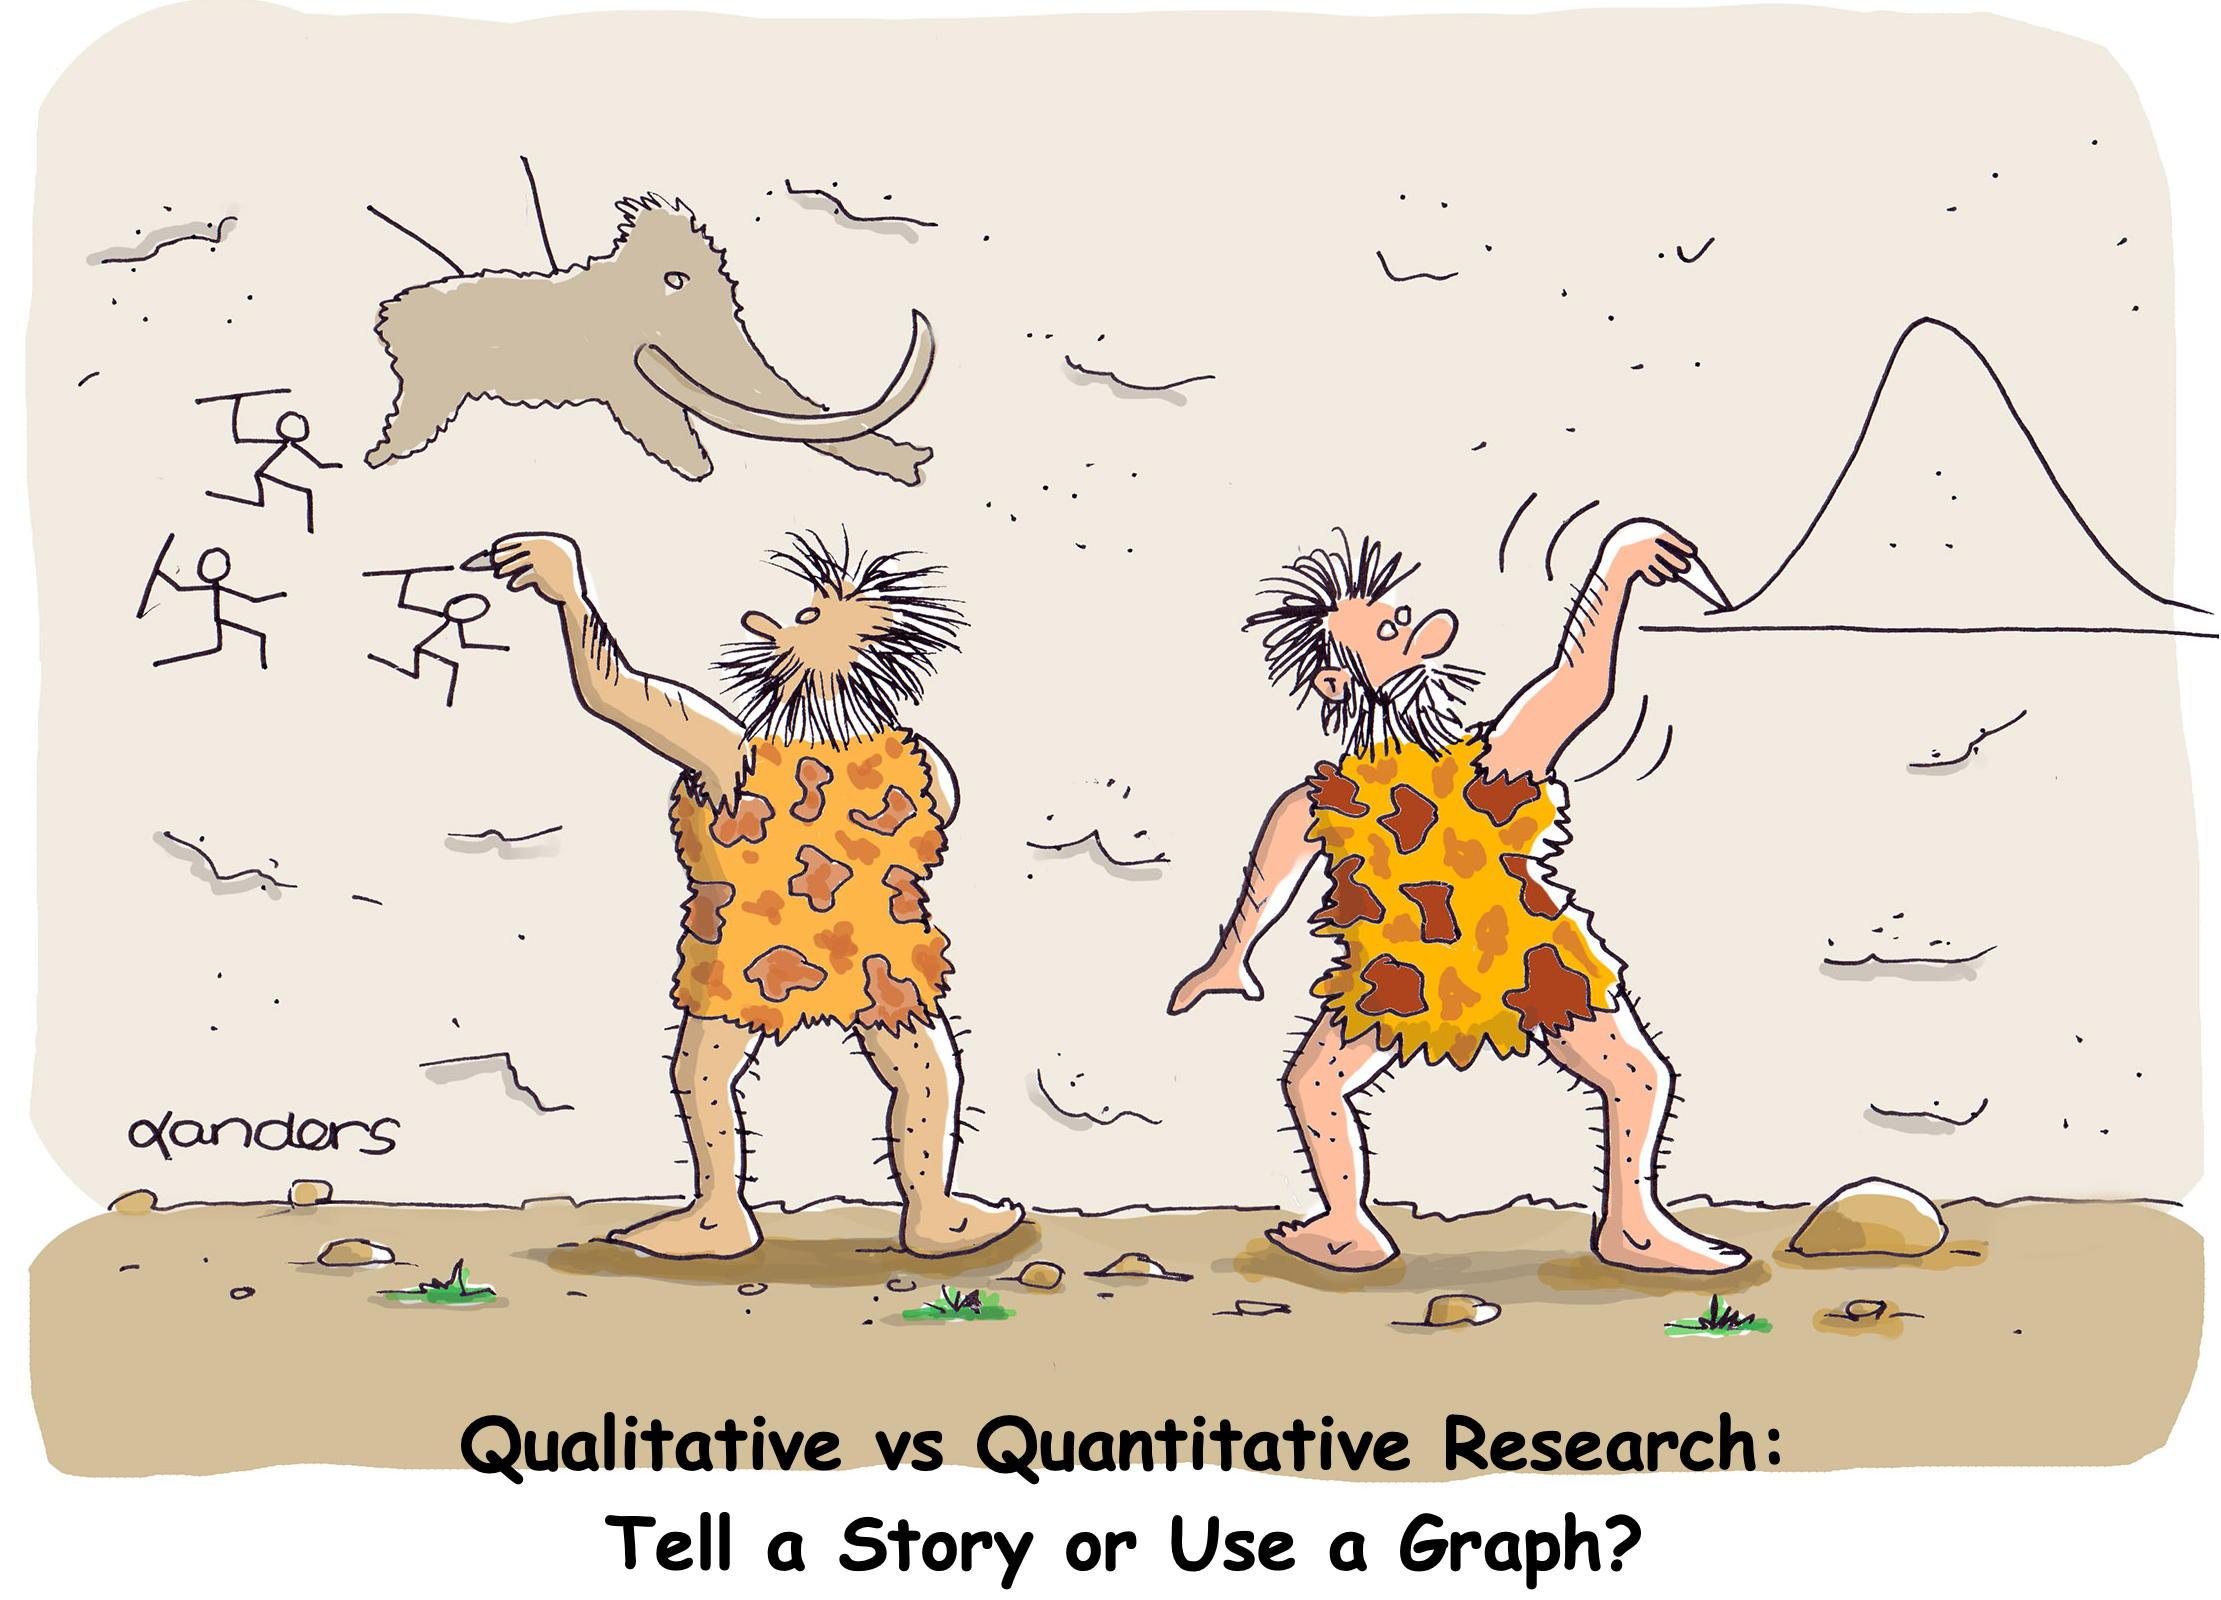 Cartoon about qualitative vs quantitative research